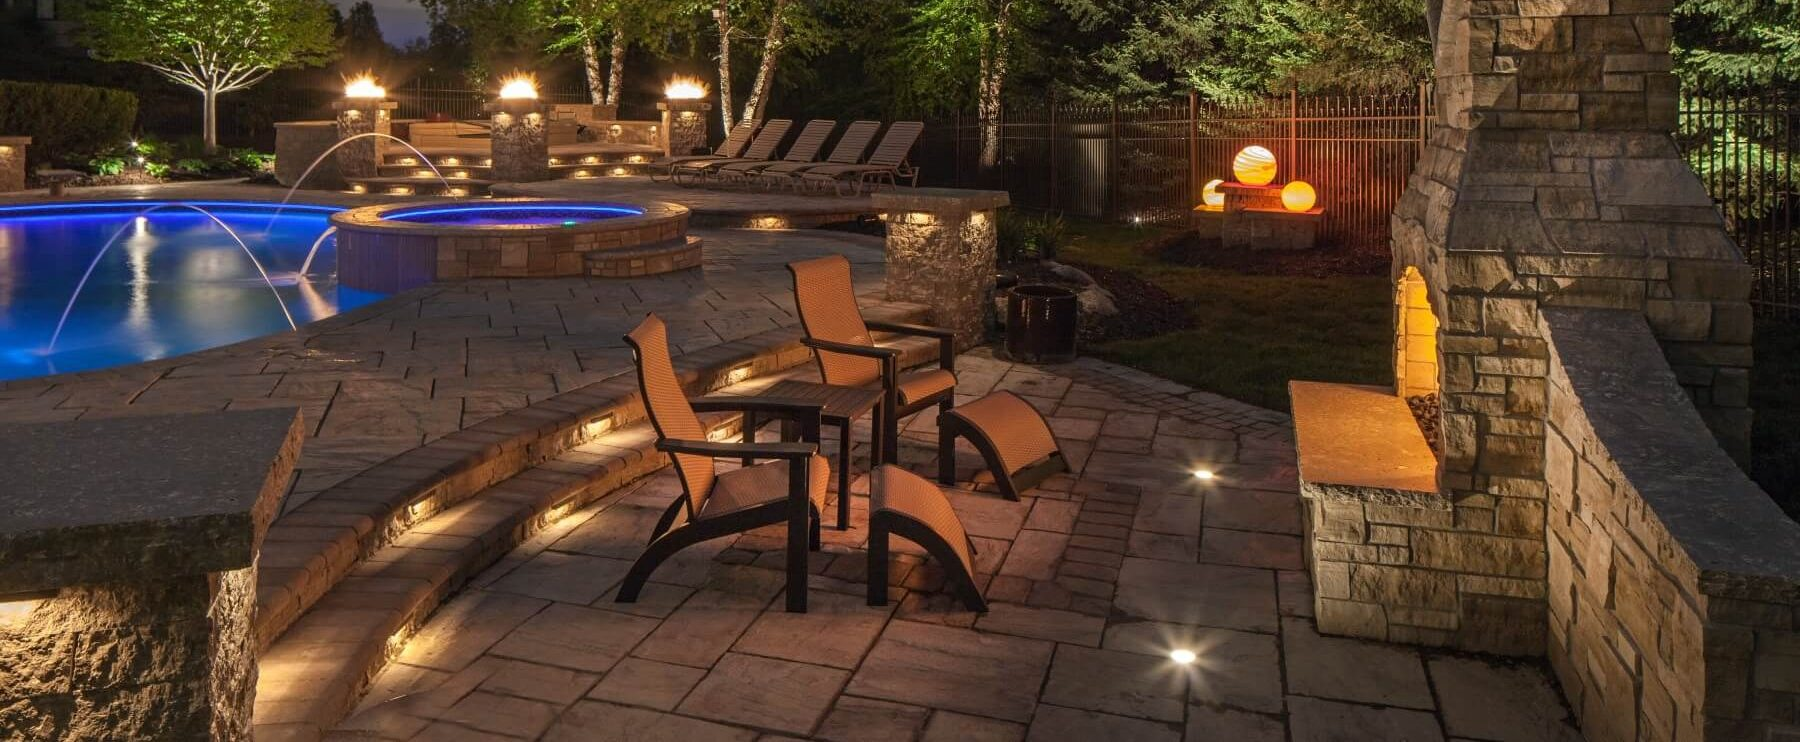 Outdoor Landscape Lighting Ideas & Inspiration